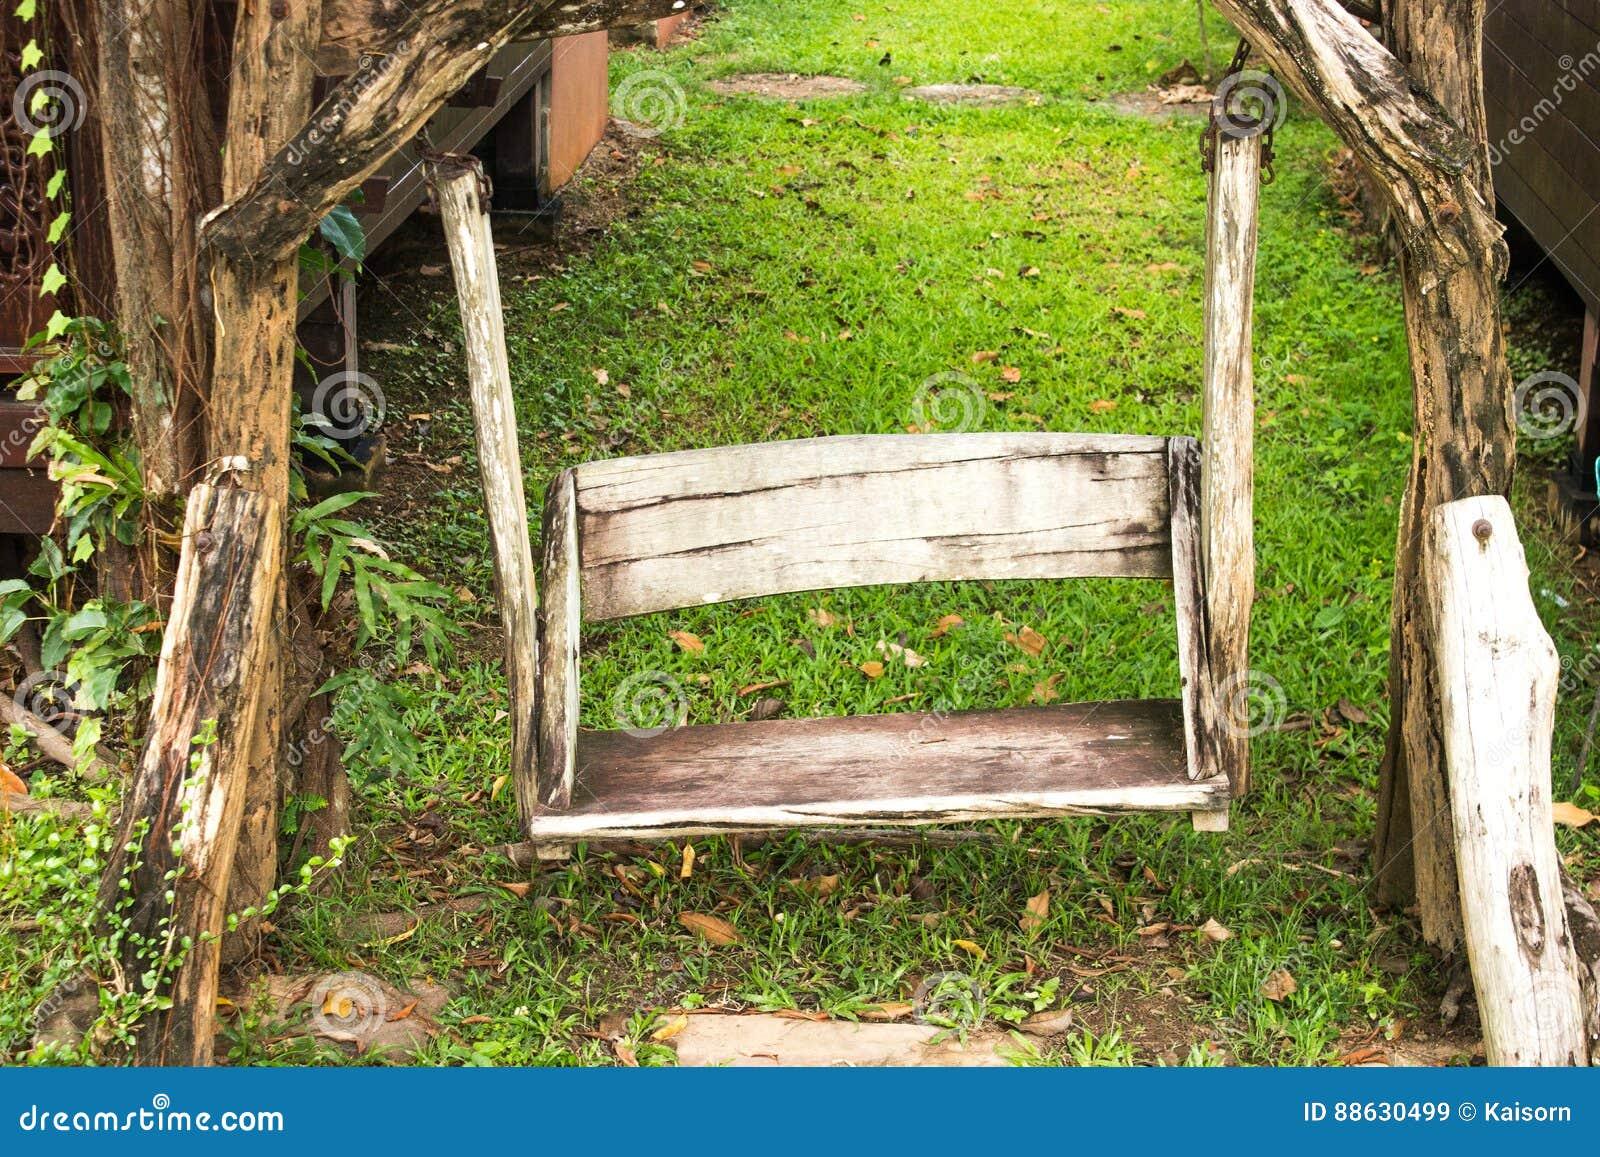 background garden porch swing wooden - Wooden Porch Swing